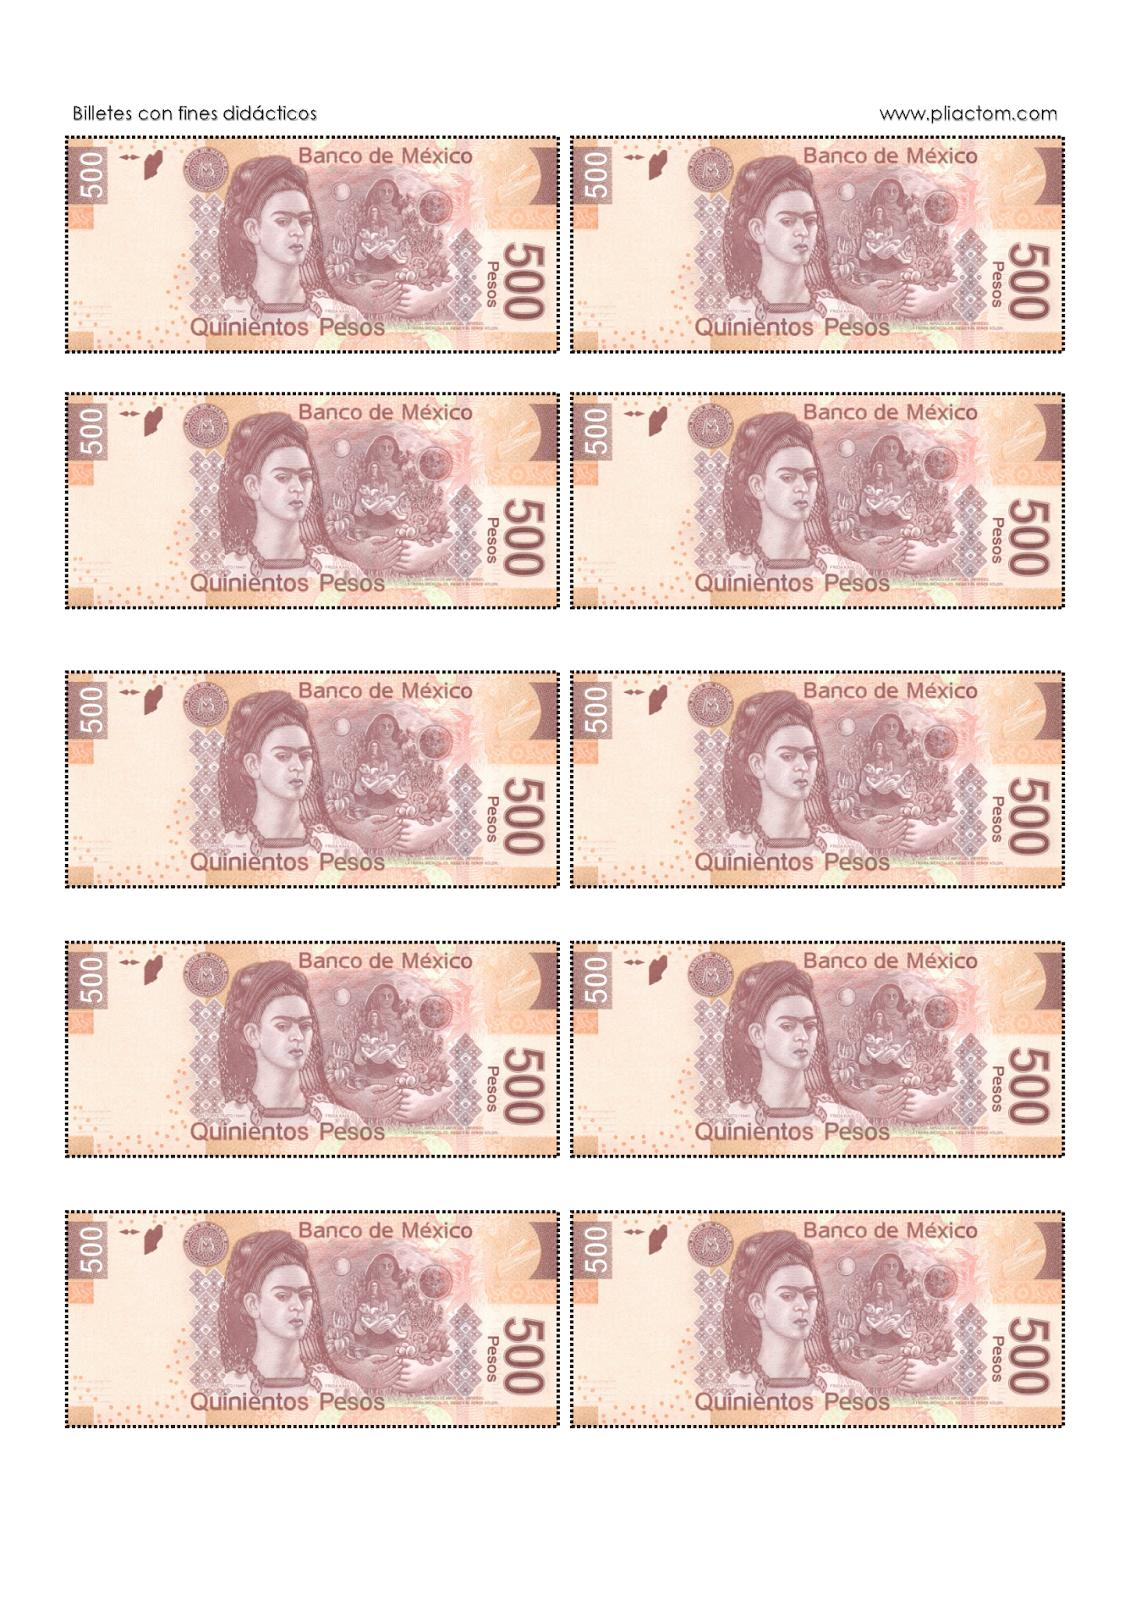 Billetes didácticos para imprimir - Recursos e información para ...